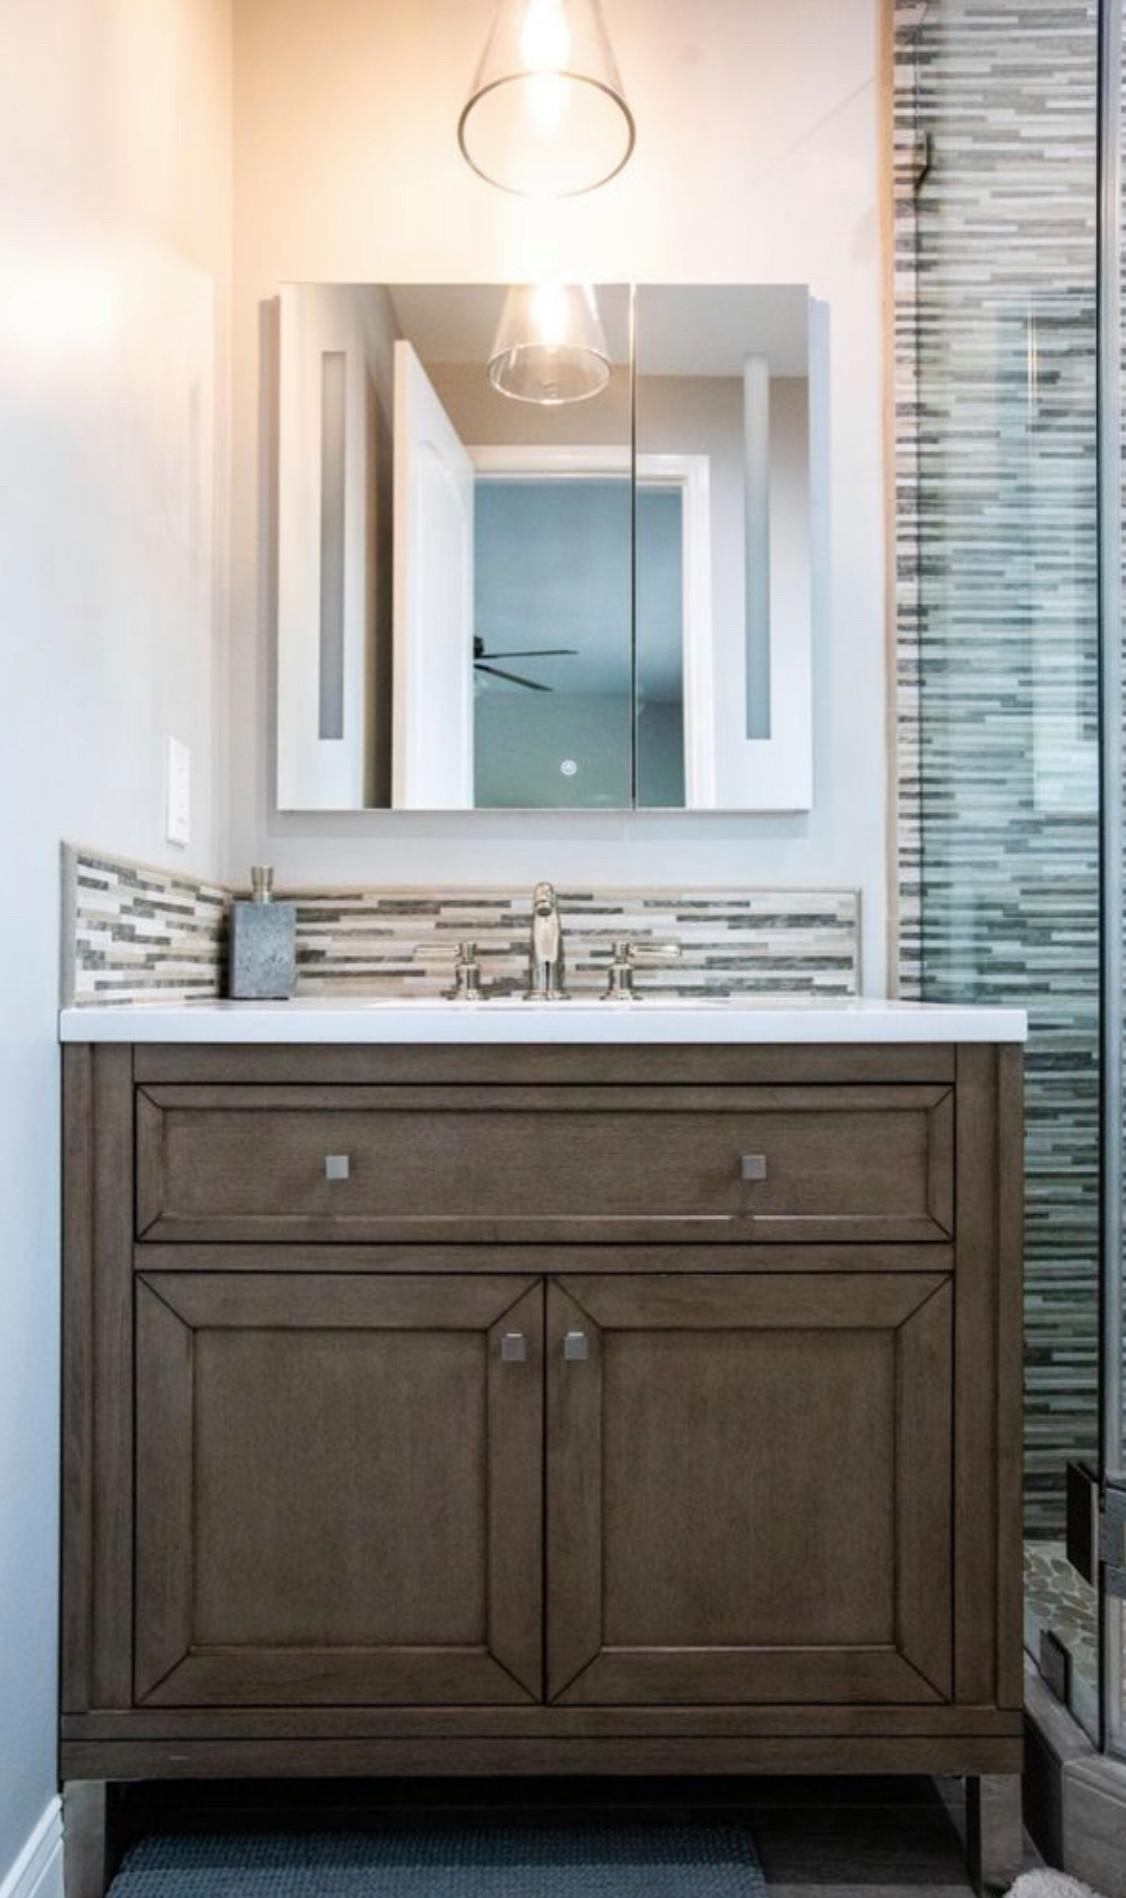 Bathroom remodeling in Simi Valley